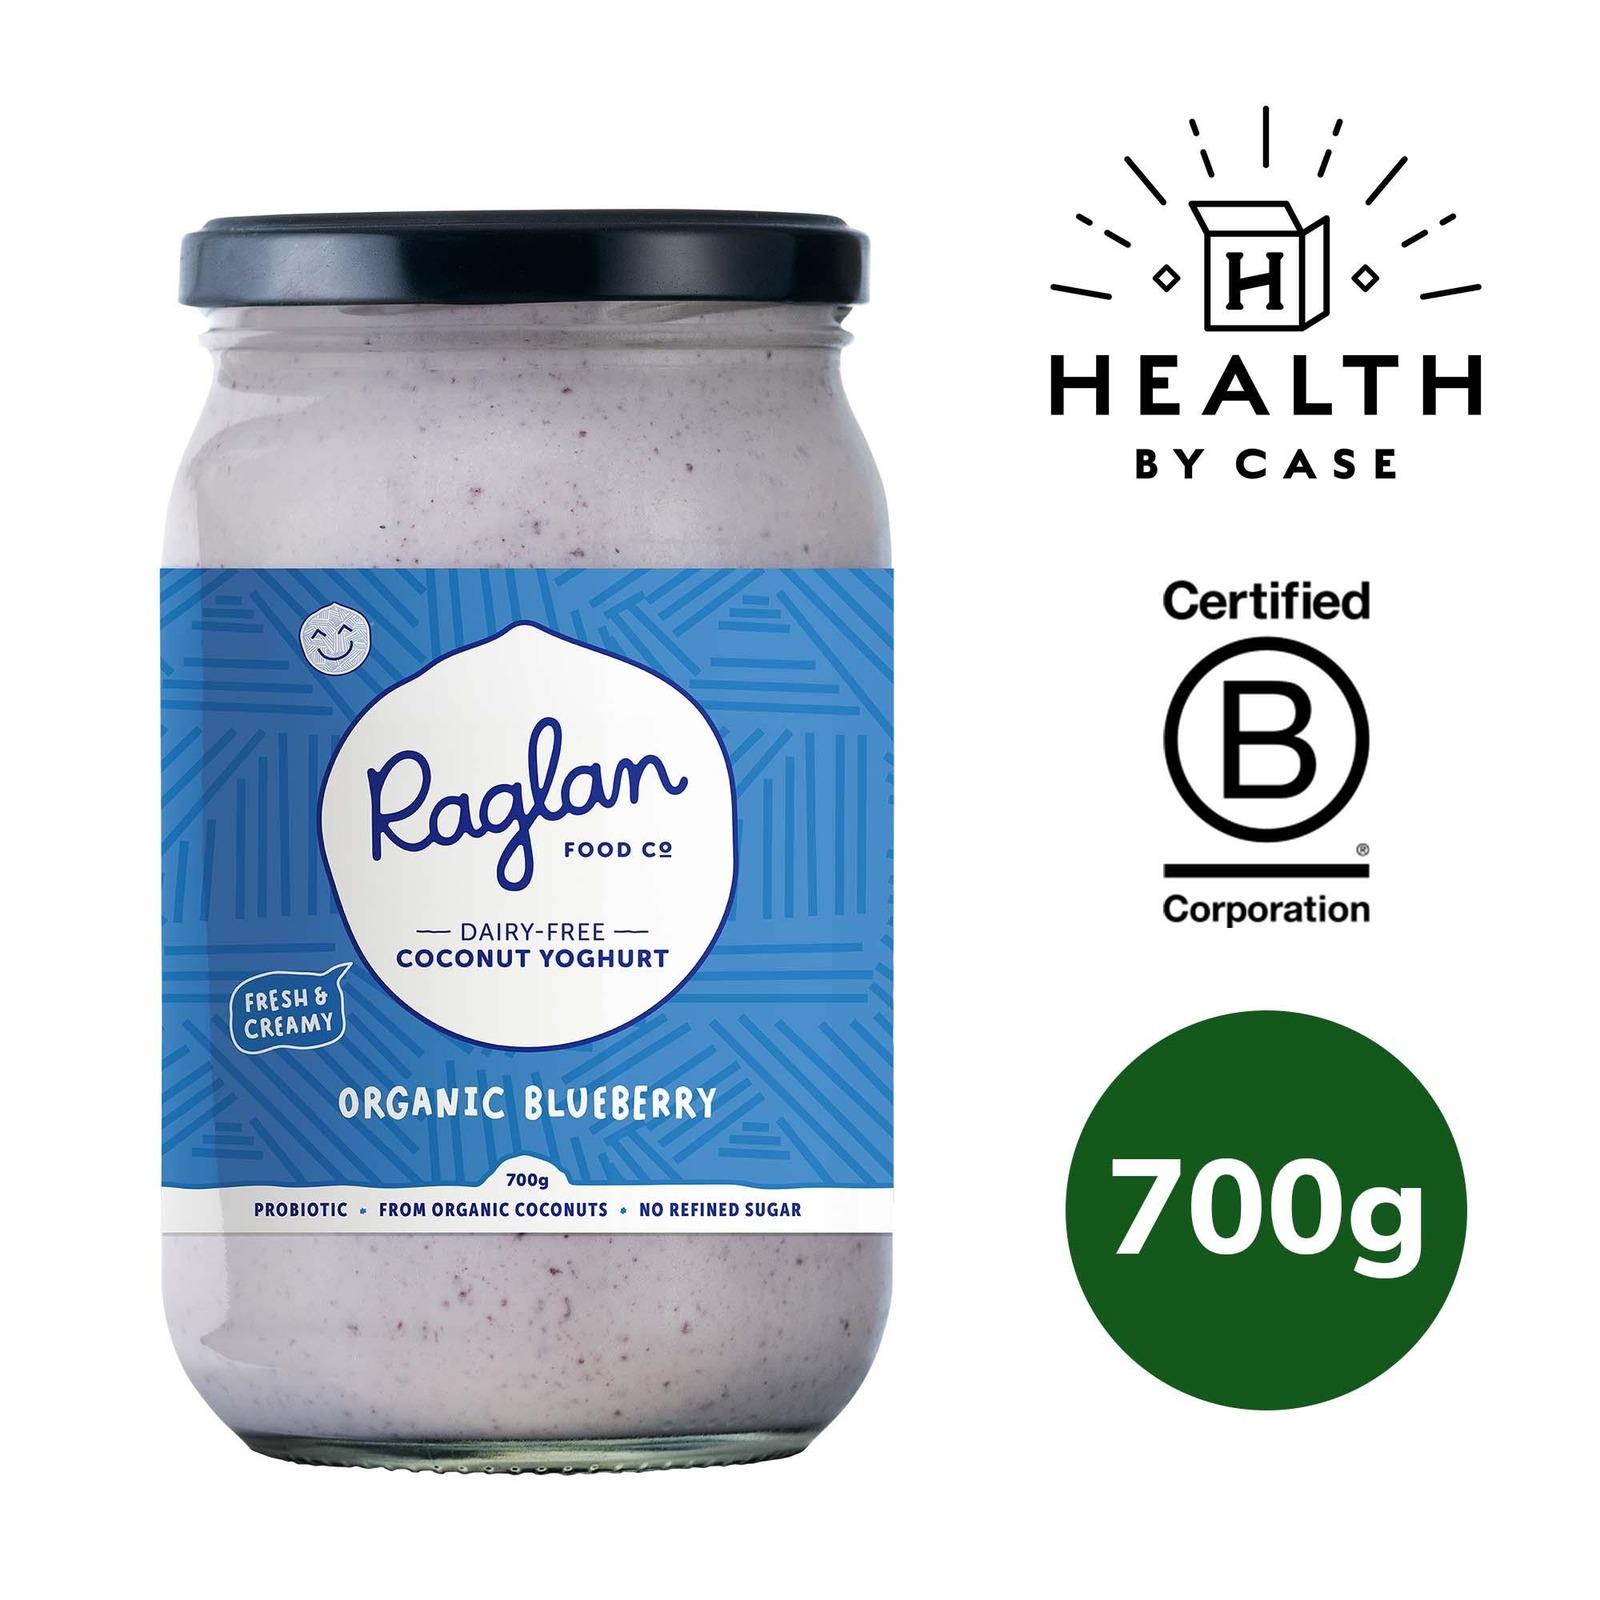 Raglan Food Company Coconut Yoghurt - Organic Blueberry